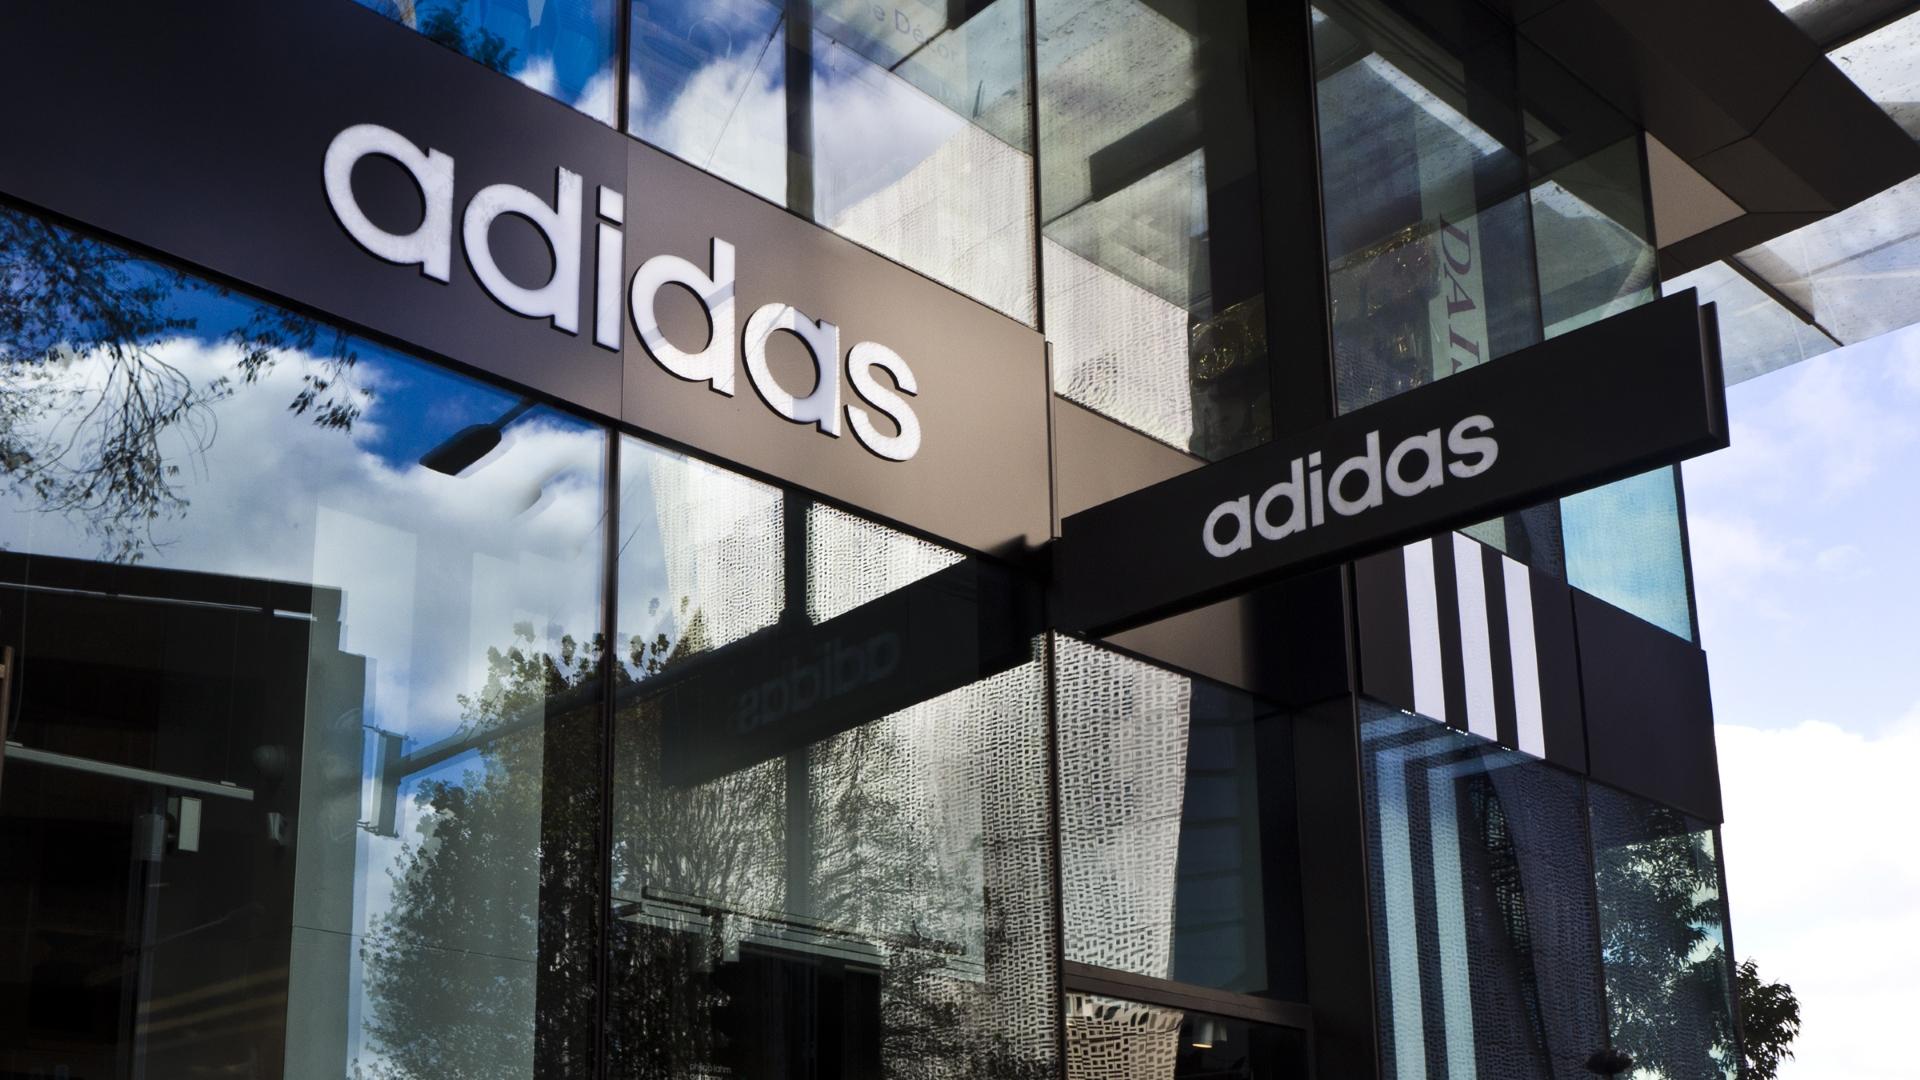 Adidas Fascia Signage